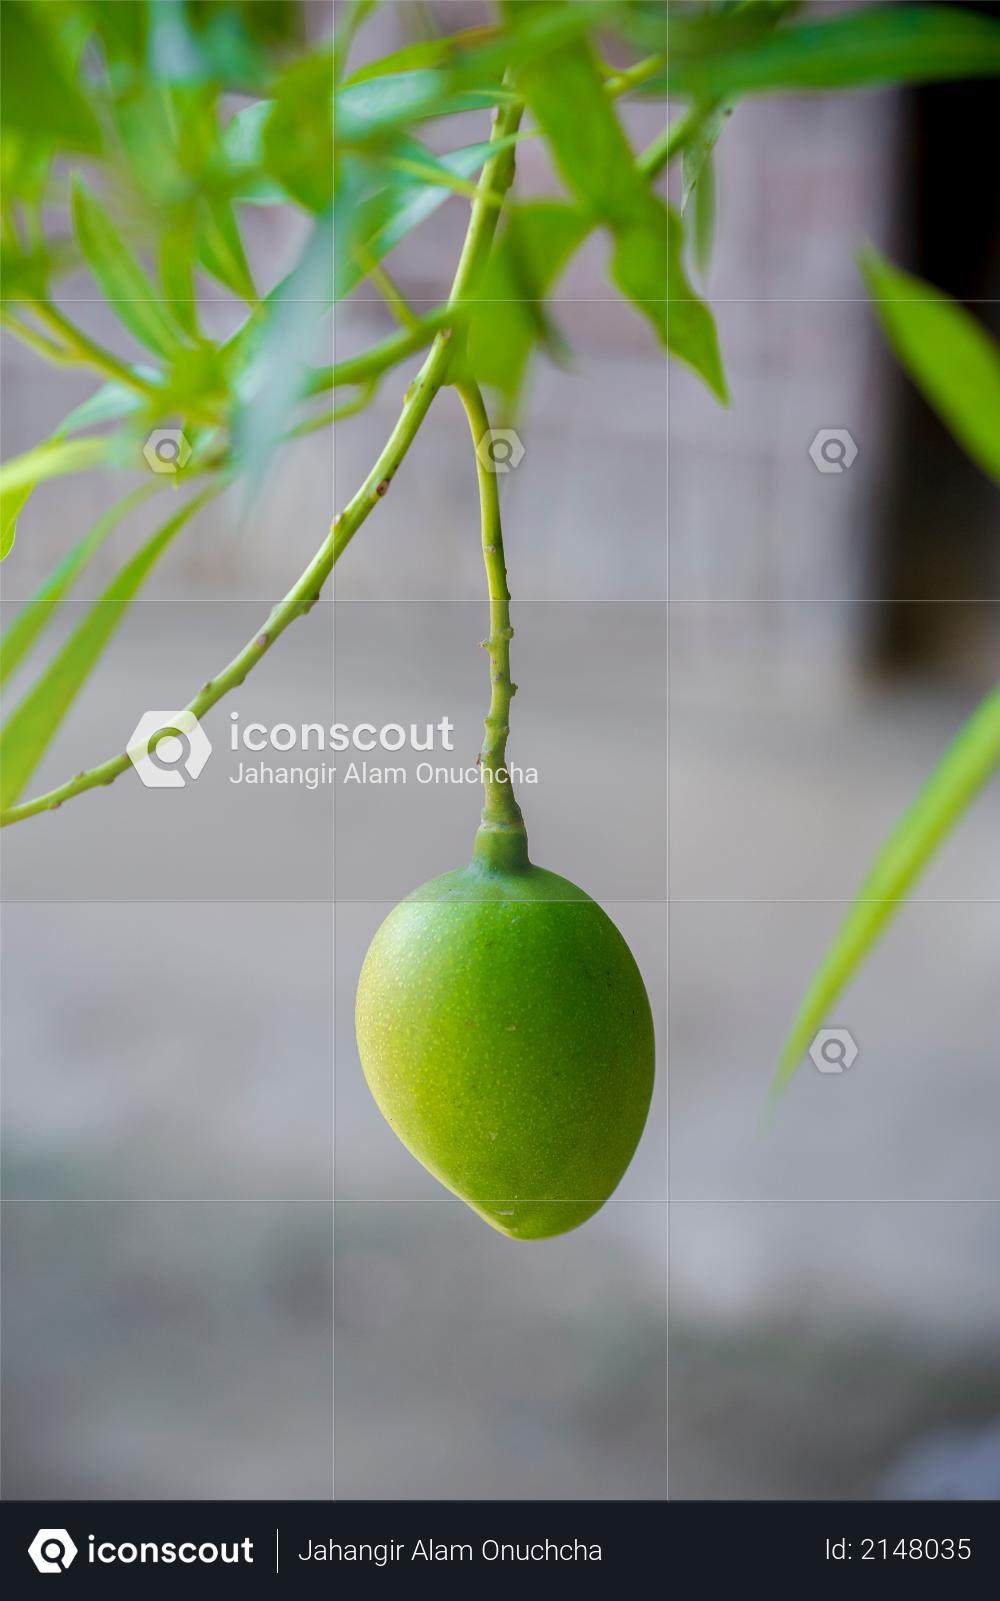 Some Mango growing on tree in areas district of Thakurgong, Bangladesh Photo